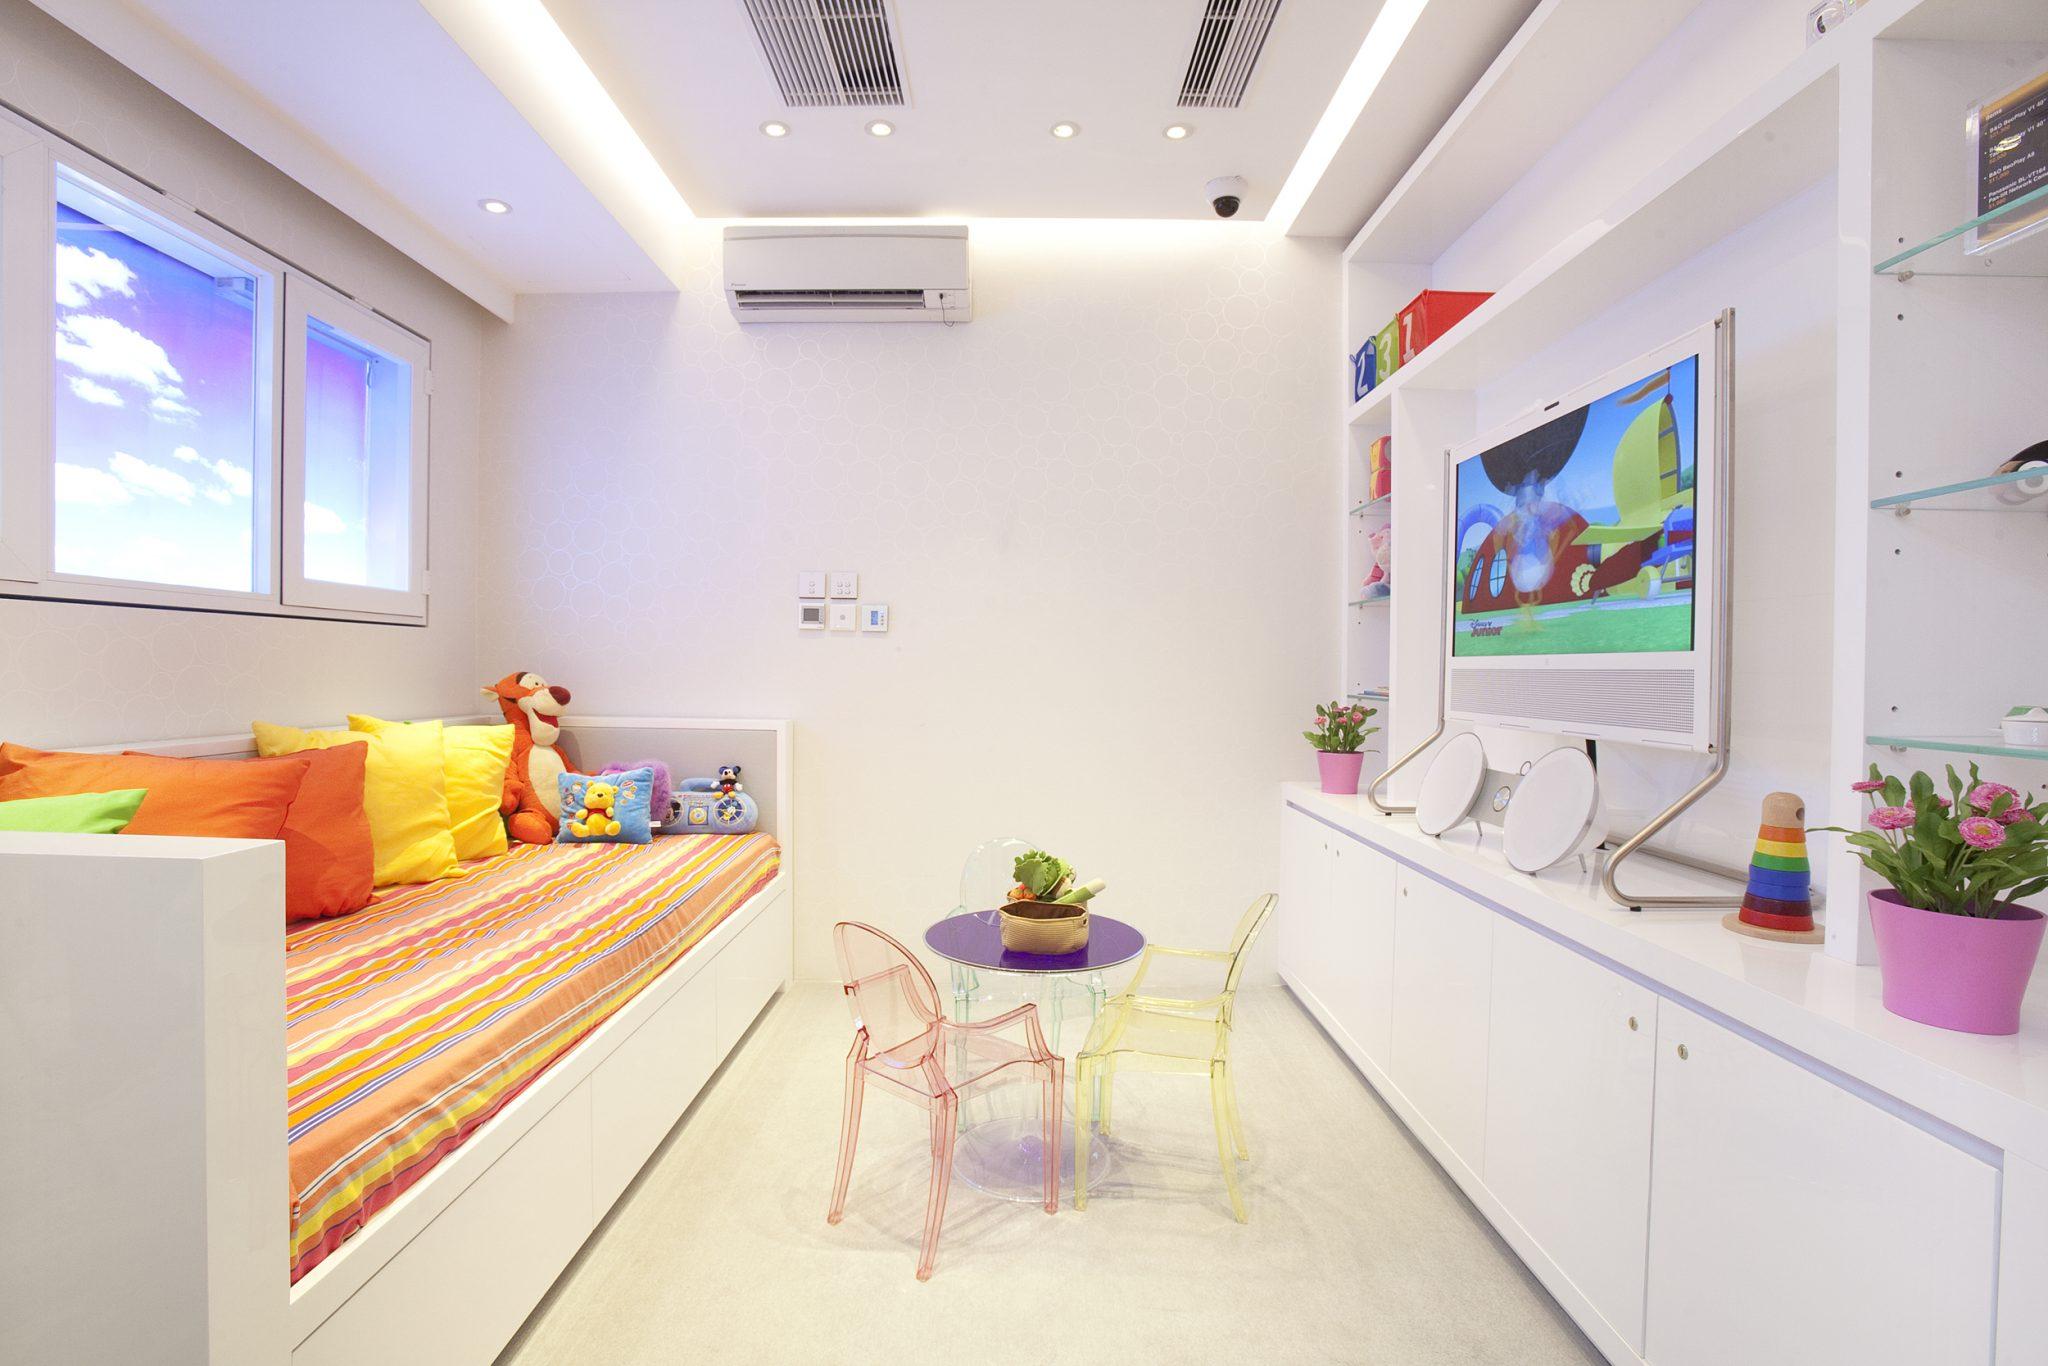 pccw hkt signature store central clifton leung design workshop. Black Bedroom Furniture Sets. Home Design Ideas